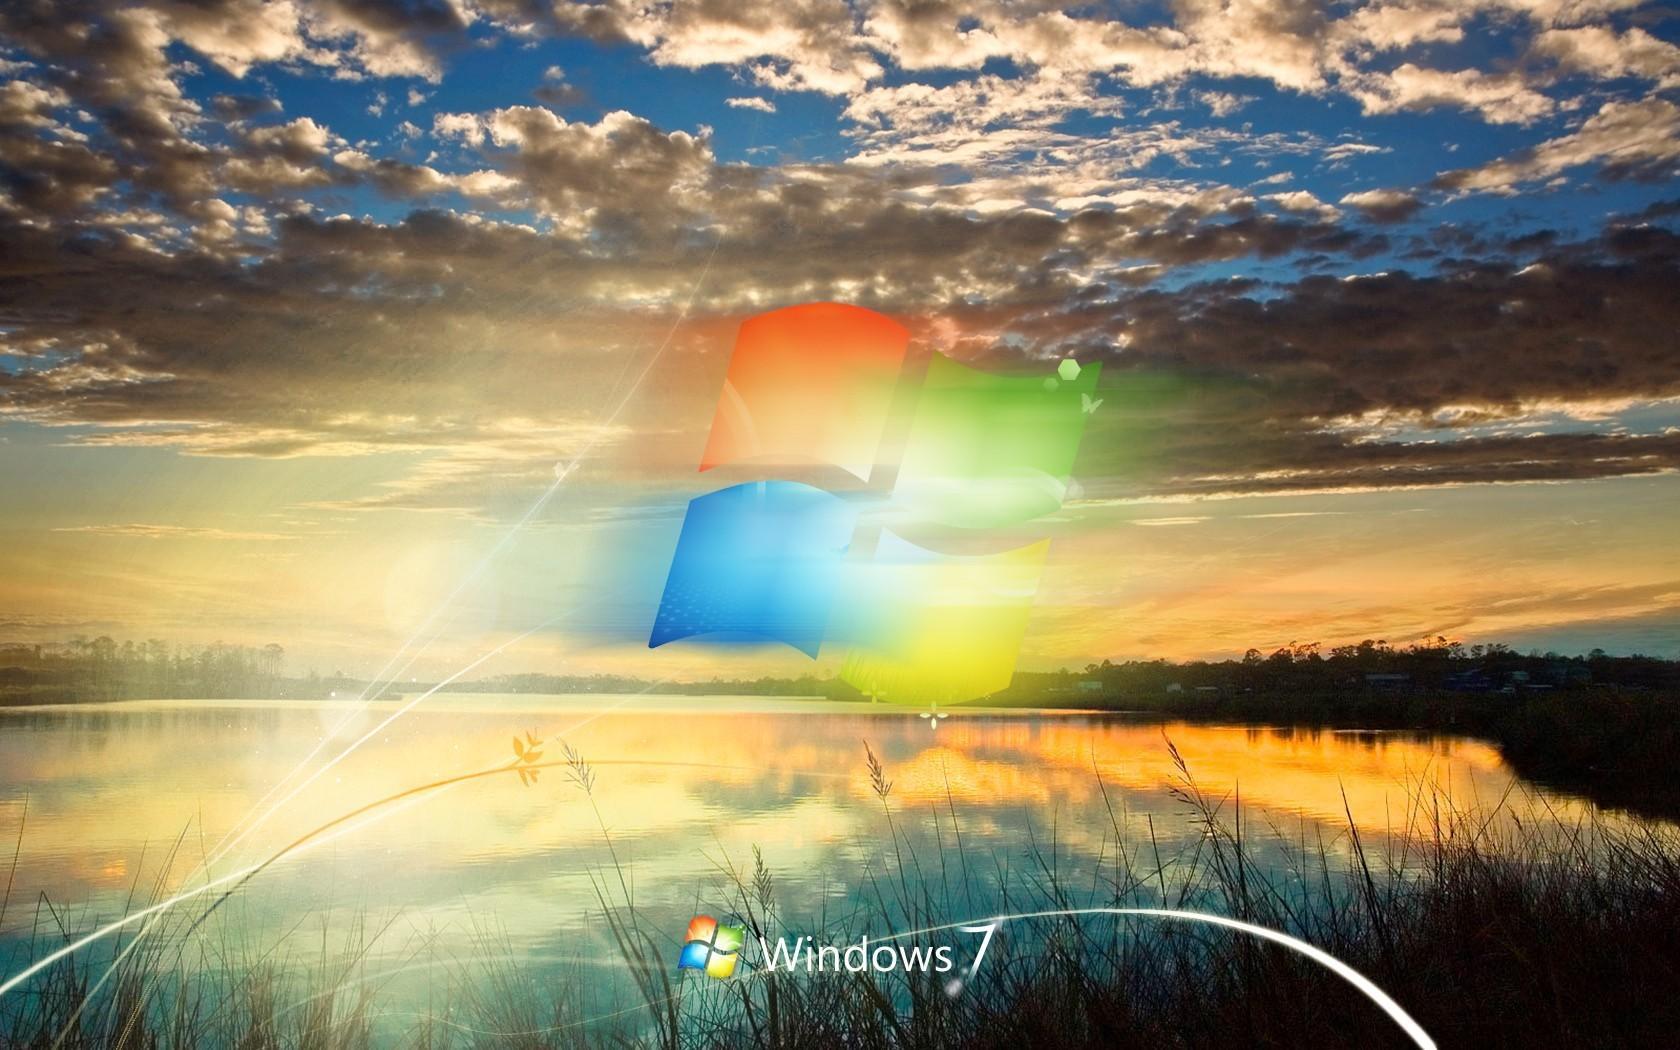 обои рабочего стола windows 7 природа